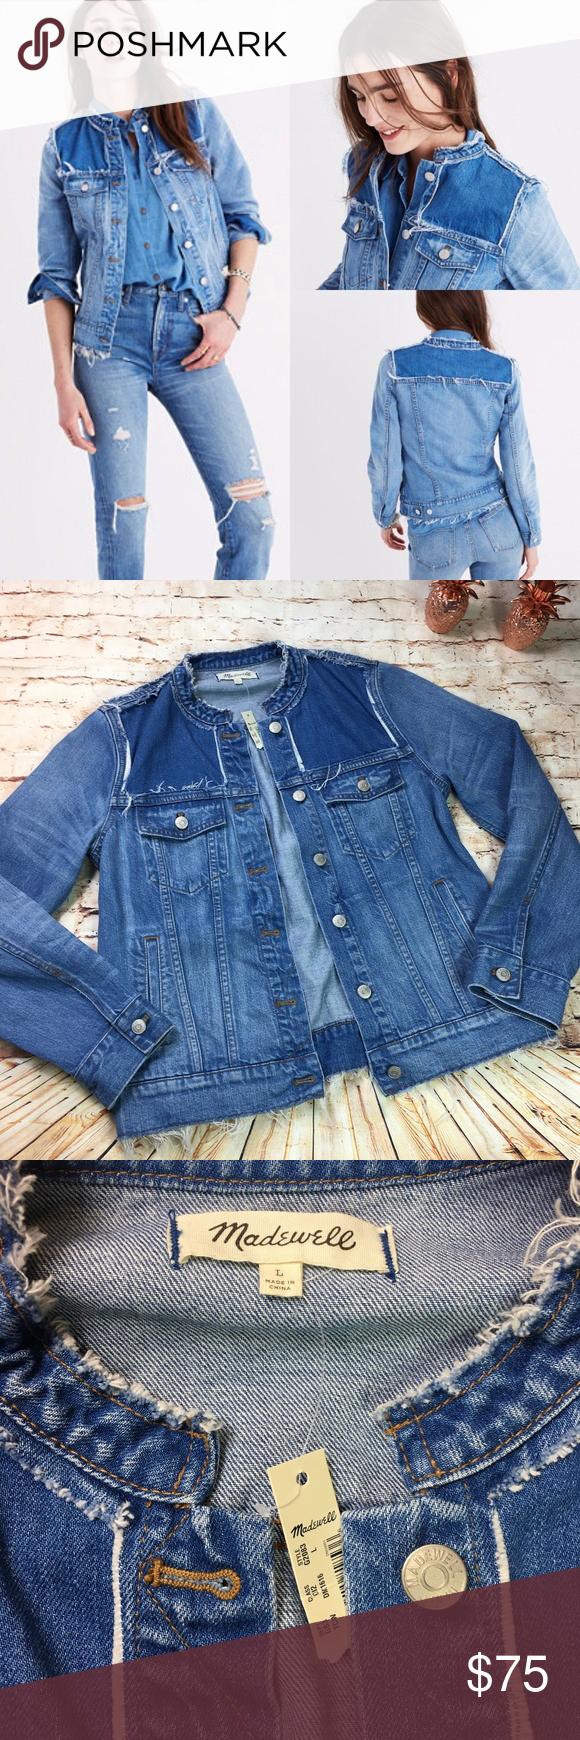 Madewell Distressed Collarless Denim Jacket Collarless Denim Jacket Clothes Design Fashion [ 1740 x 580 Pixel ]